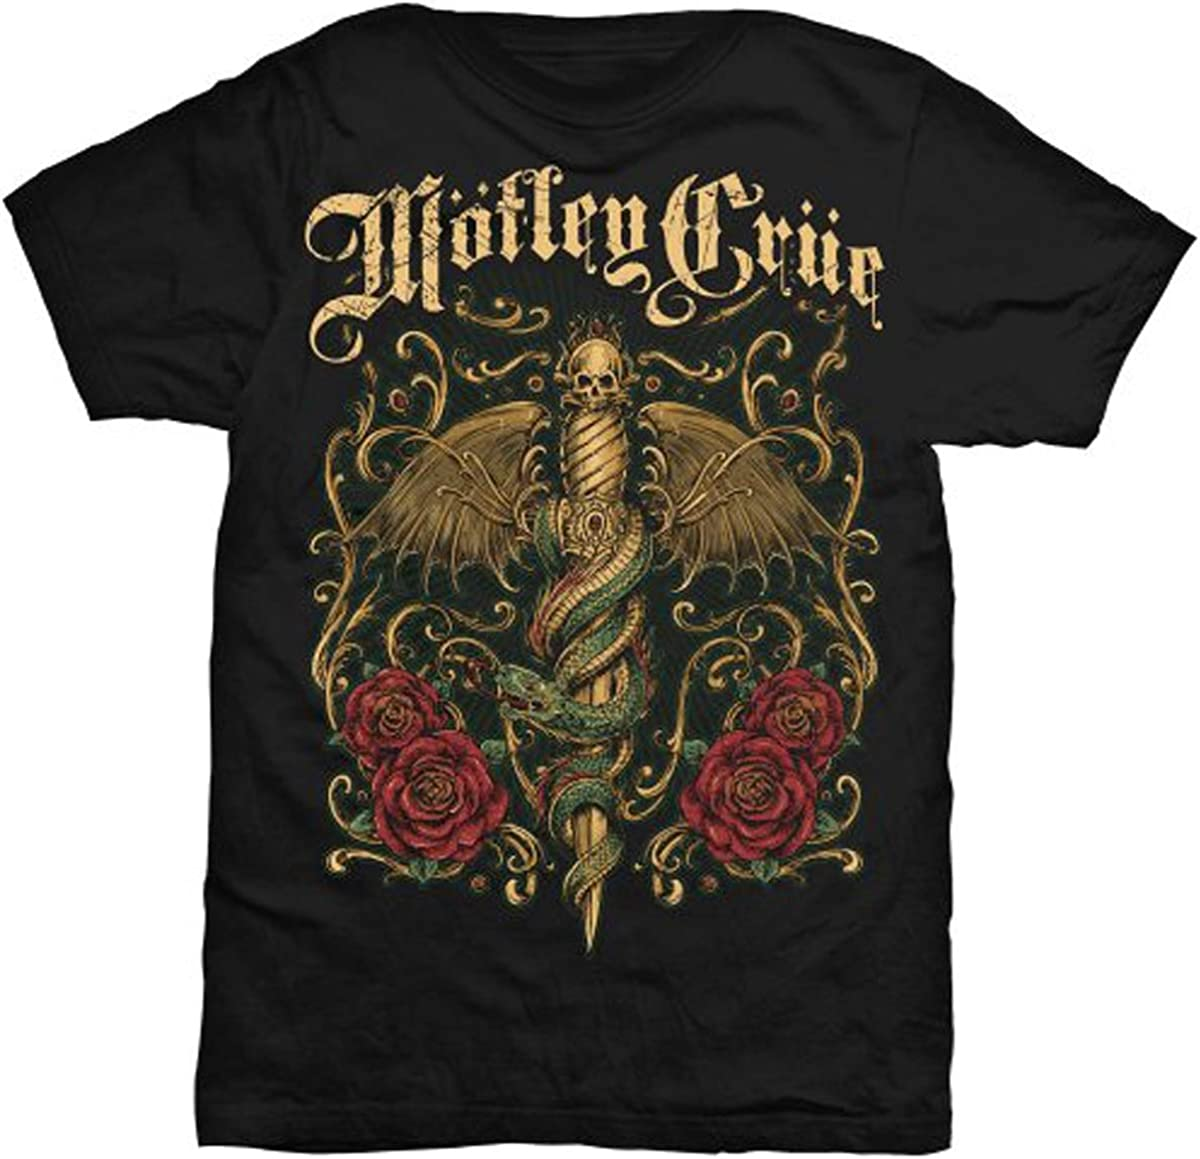 Motley Crue T Shirt Final World Tour 2015 Band Logo Officiel Homme